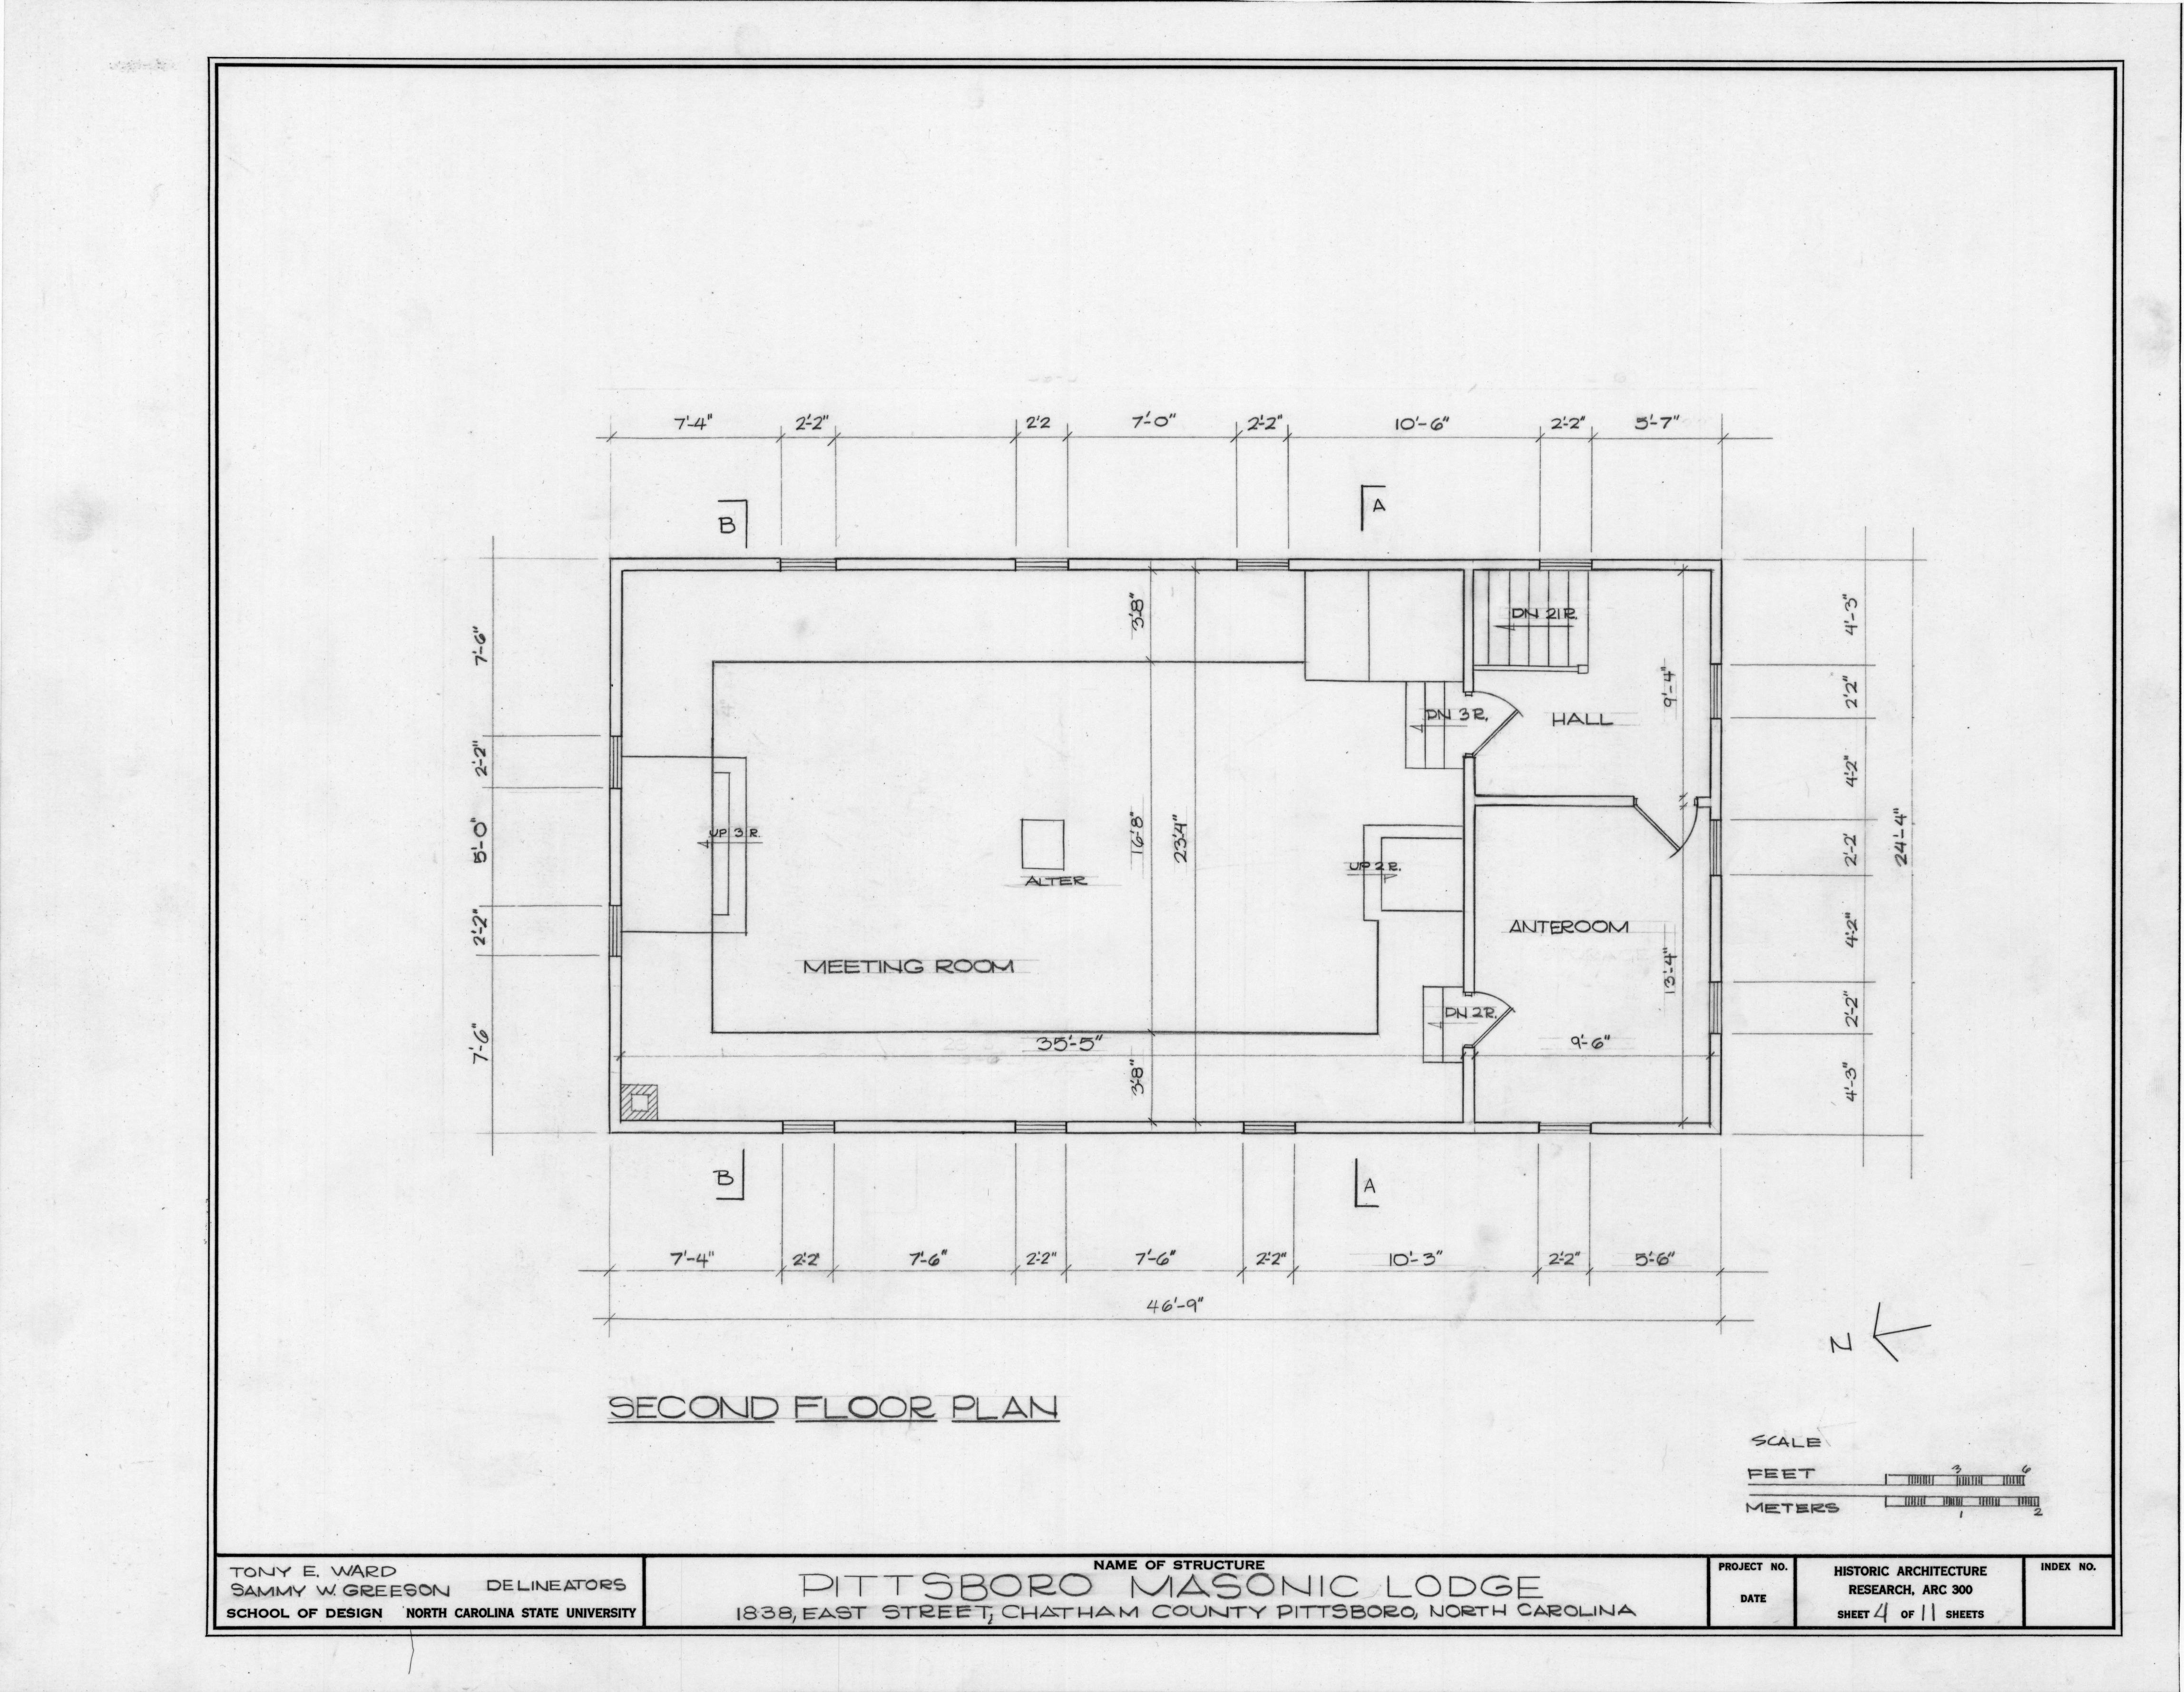 second floor plan pittsboro masonic lodge pittsboro With masonic lodge floor plan